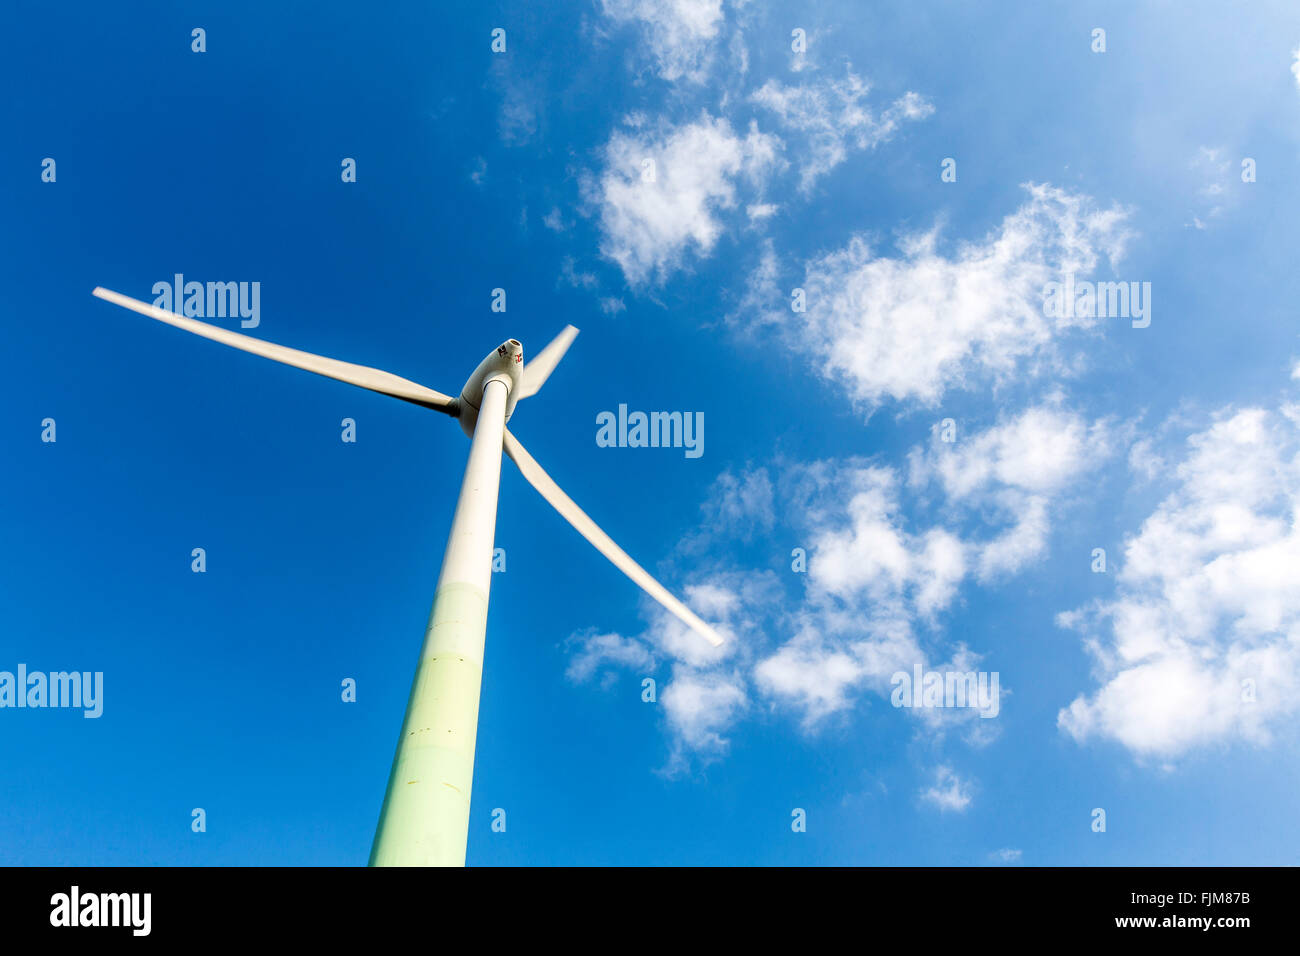 Wind power plant, wind energy turbine on mining heap Hoppenbruch, in Herten, Germany - Stock Image